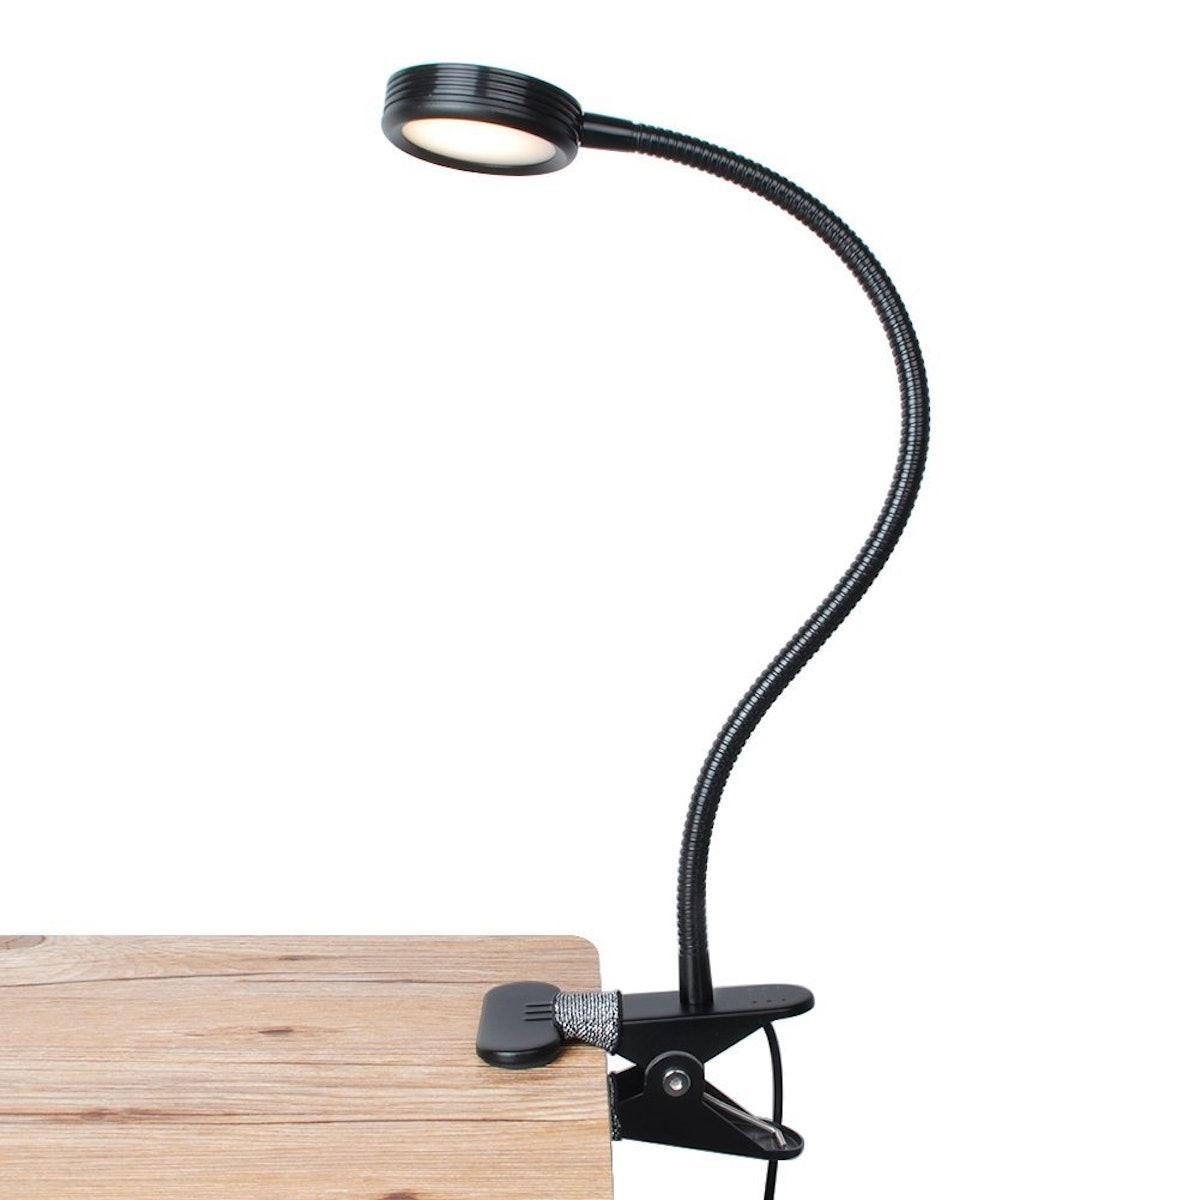 LEPOWER Clip-On Lamp